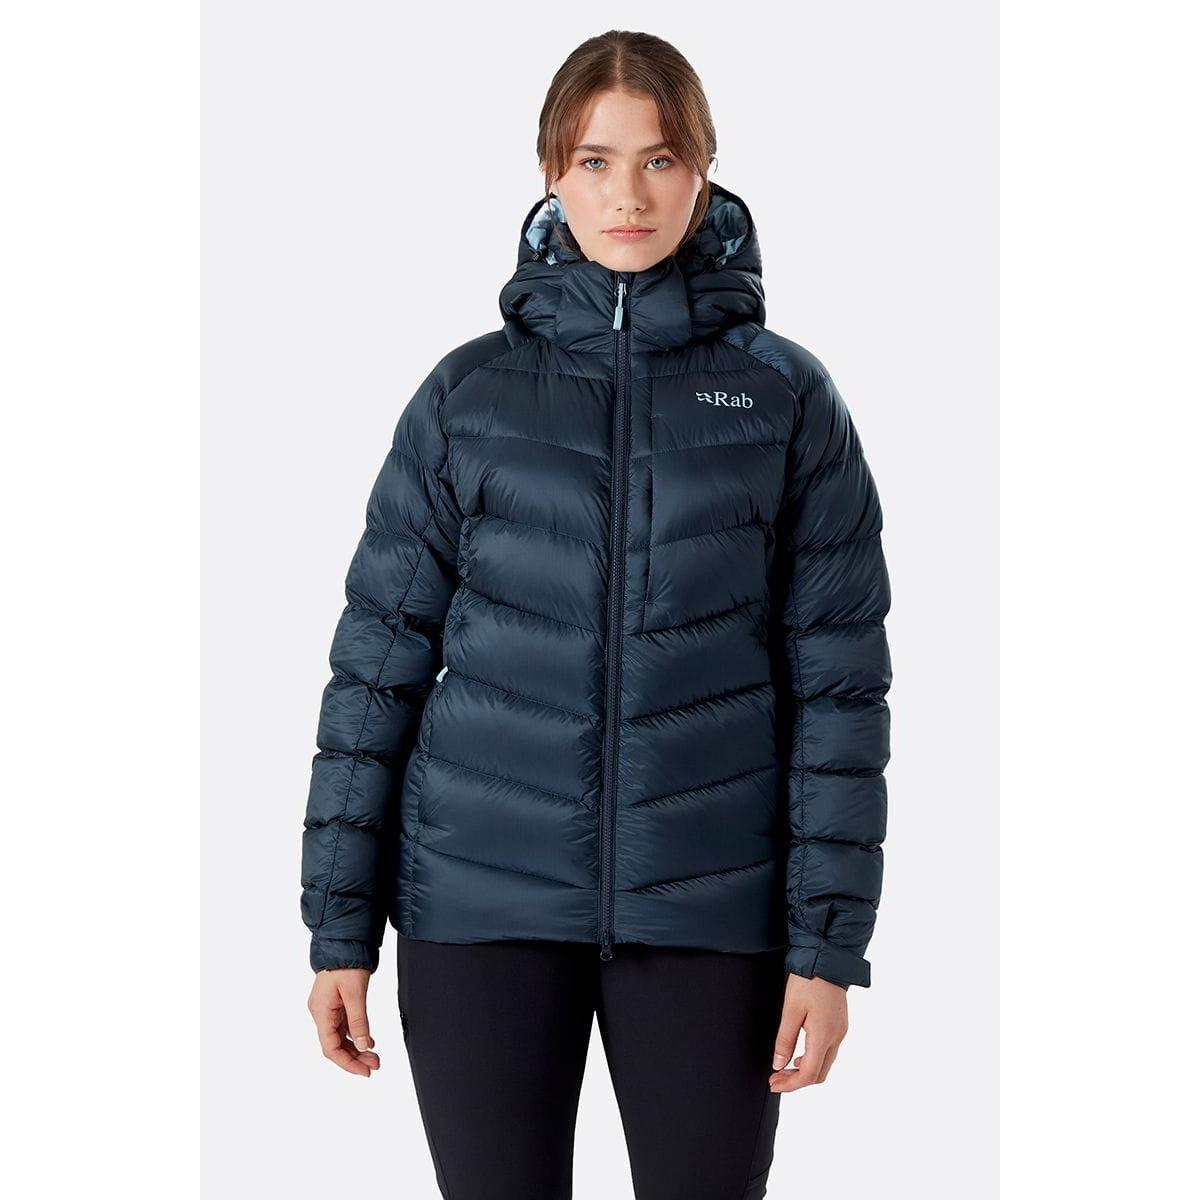 Rab Women's Rab Axion Pro Jacket - Grey